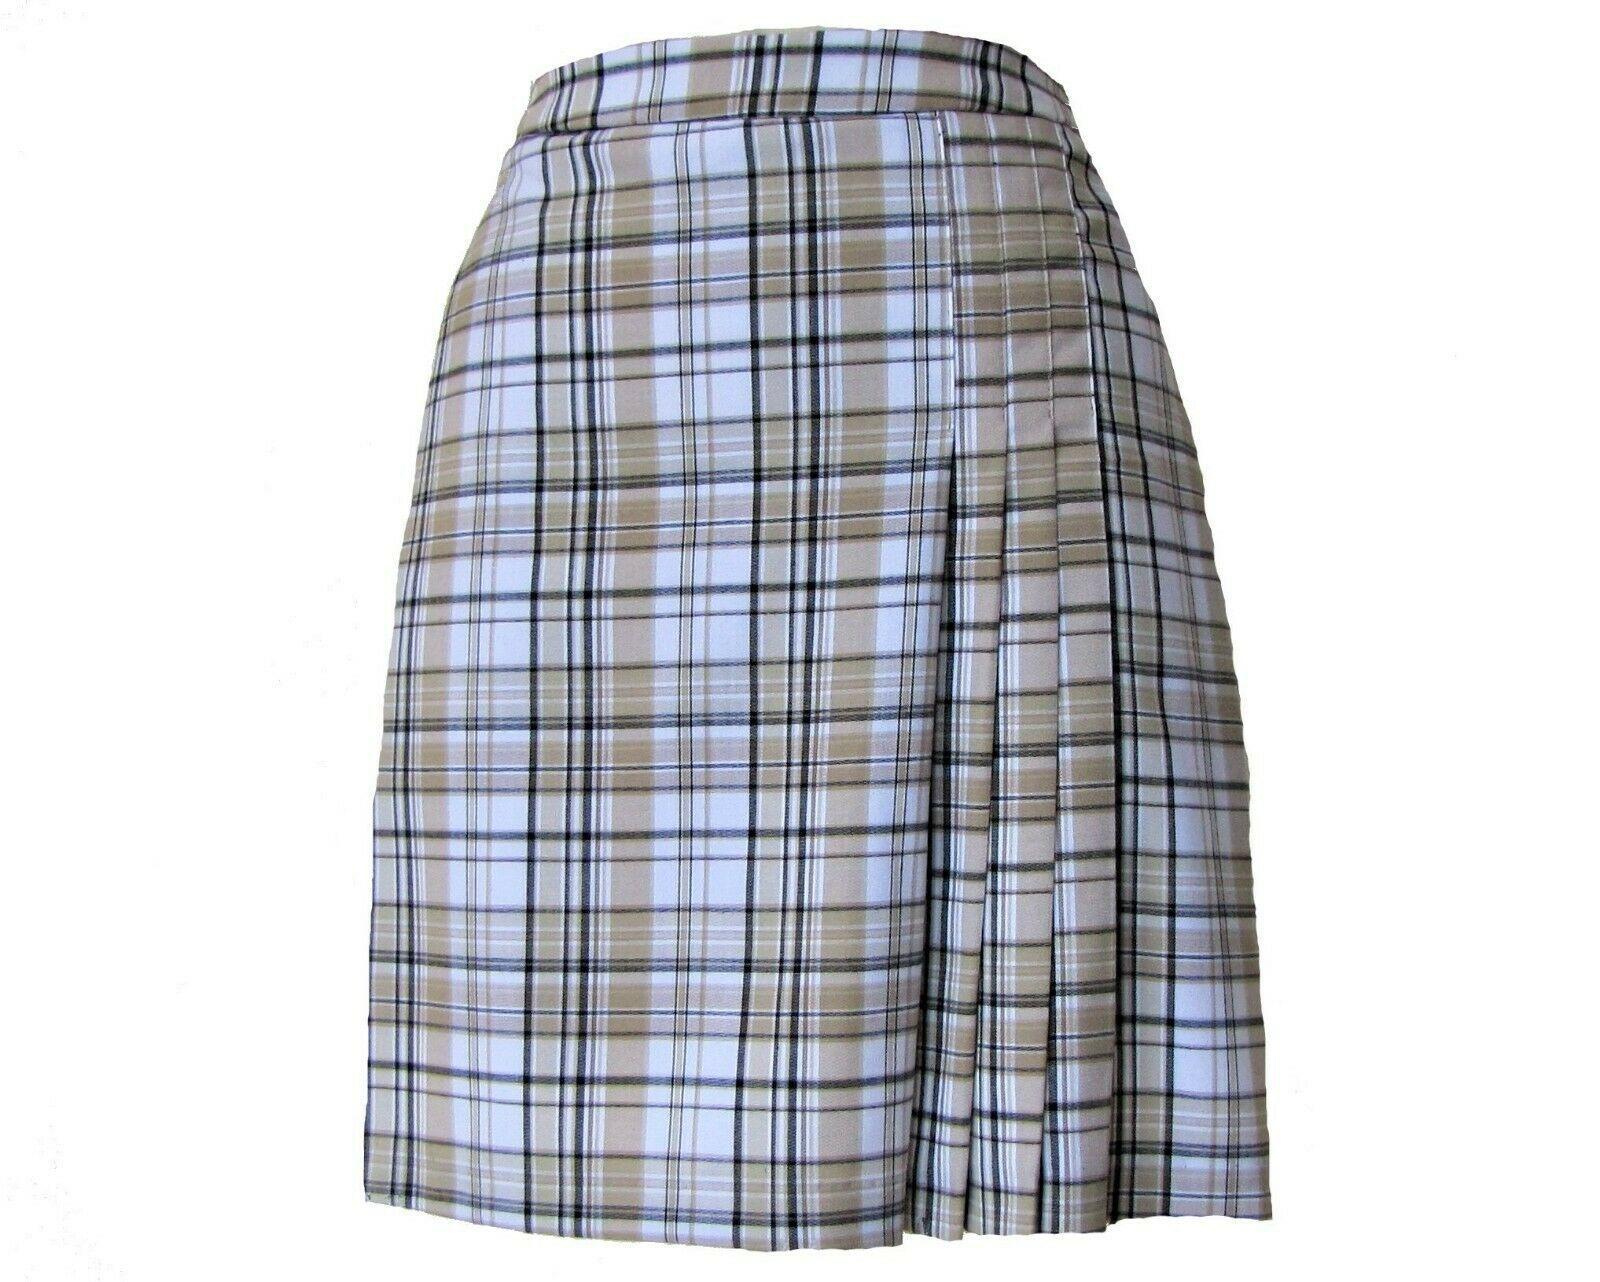 Stylish Women's Golf & Resort Black Long Sleeve Collar Top, Swarovski Buttons  image 5